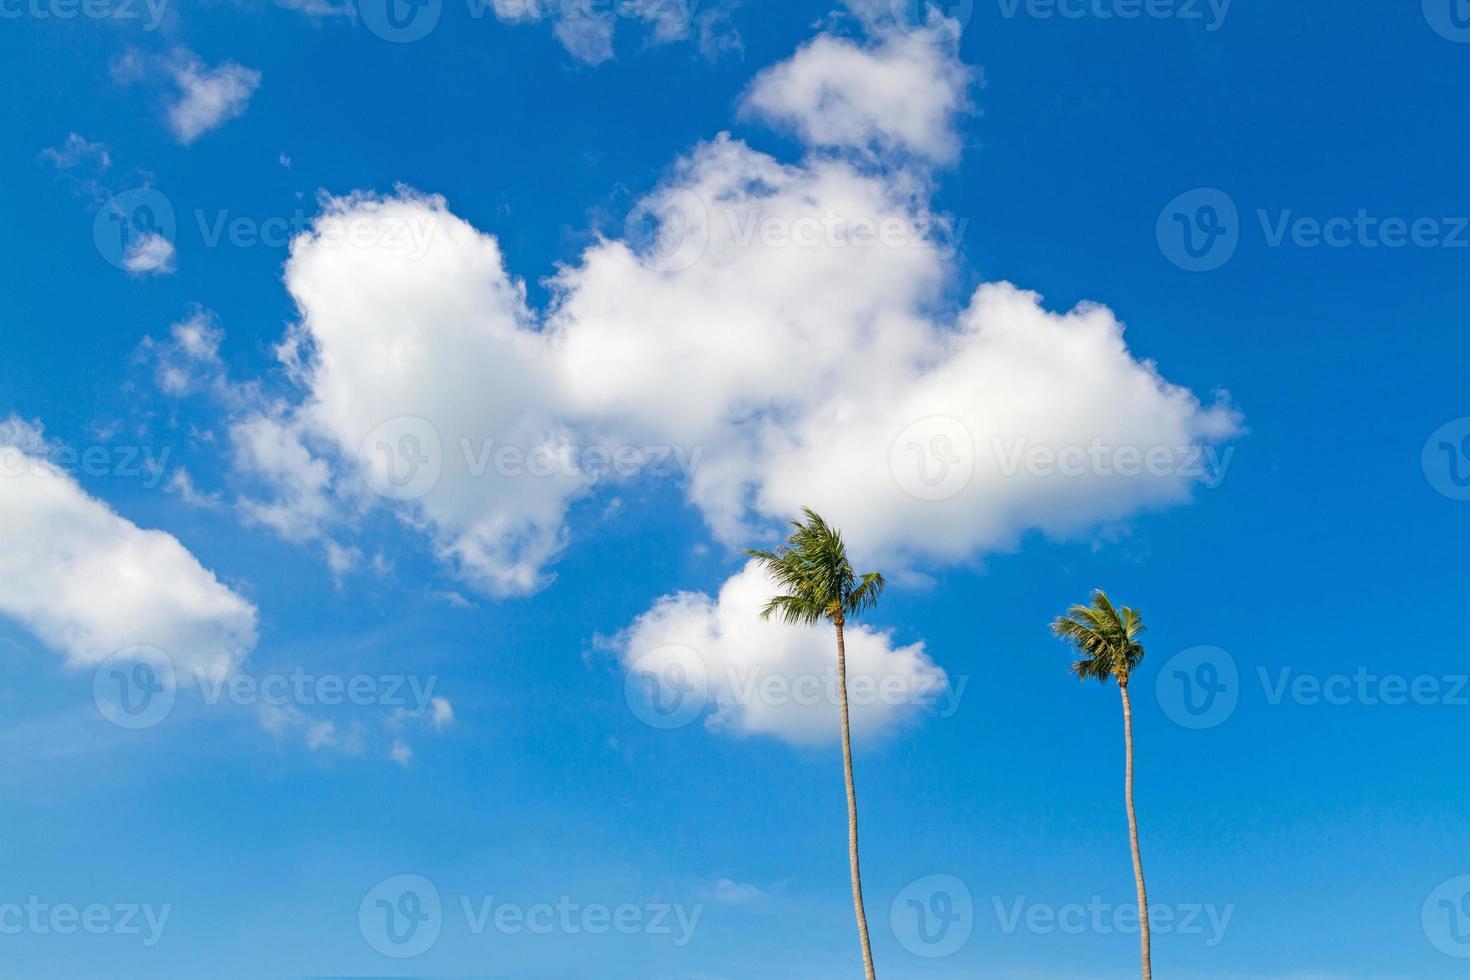 kokospalm met blauwe hemel foto